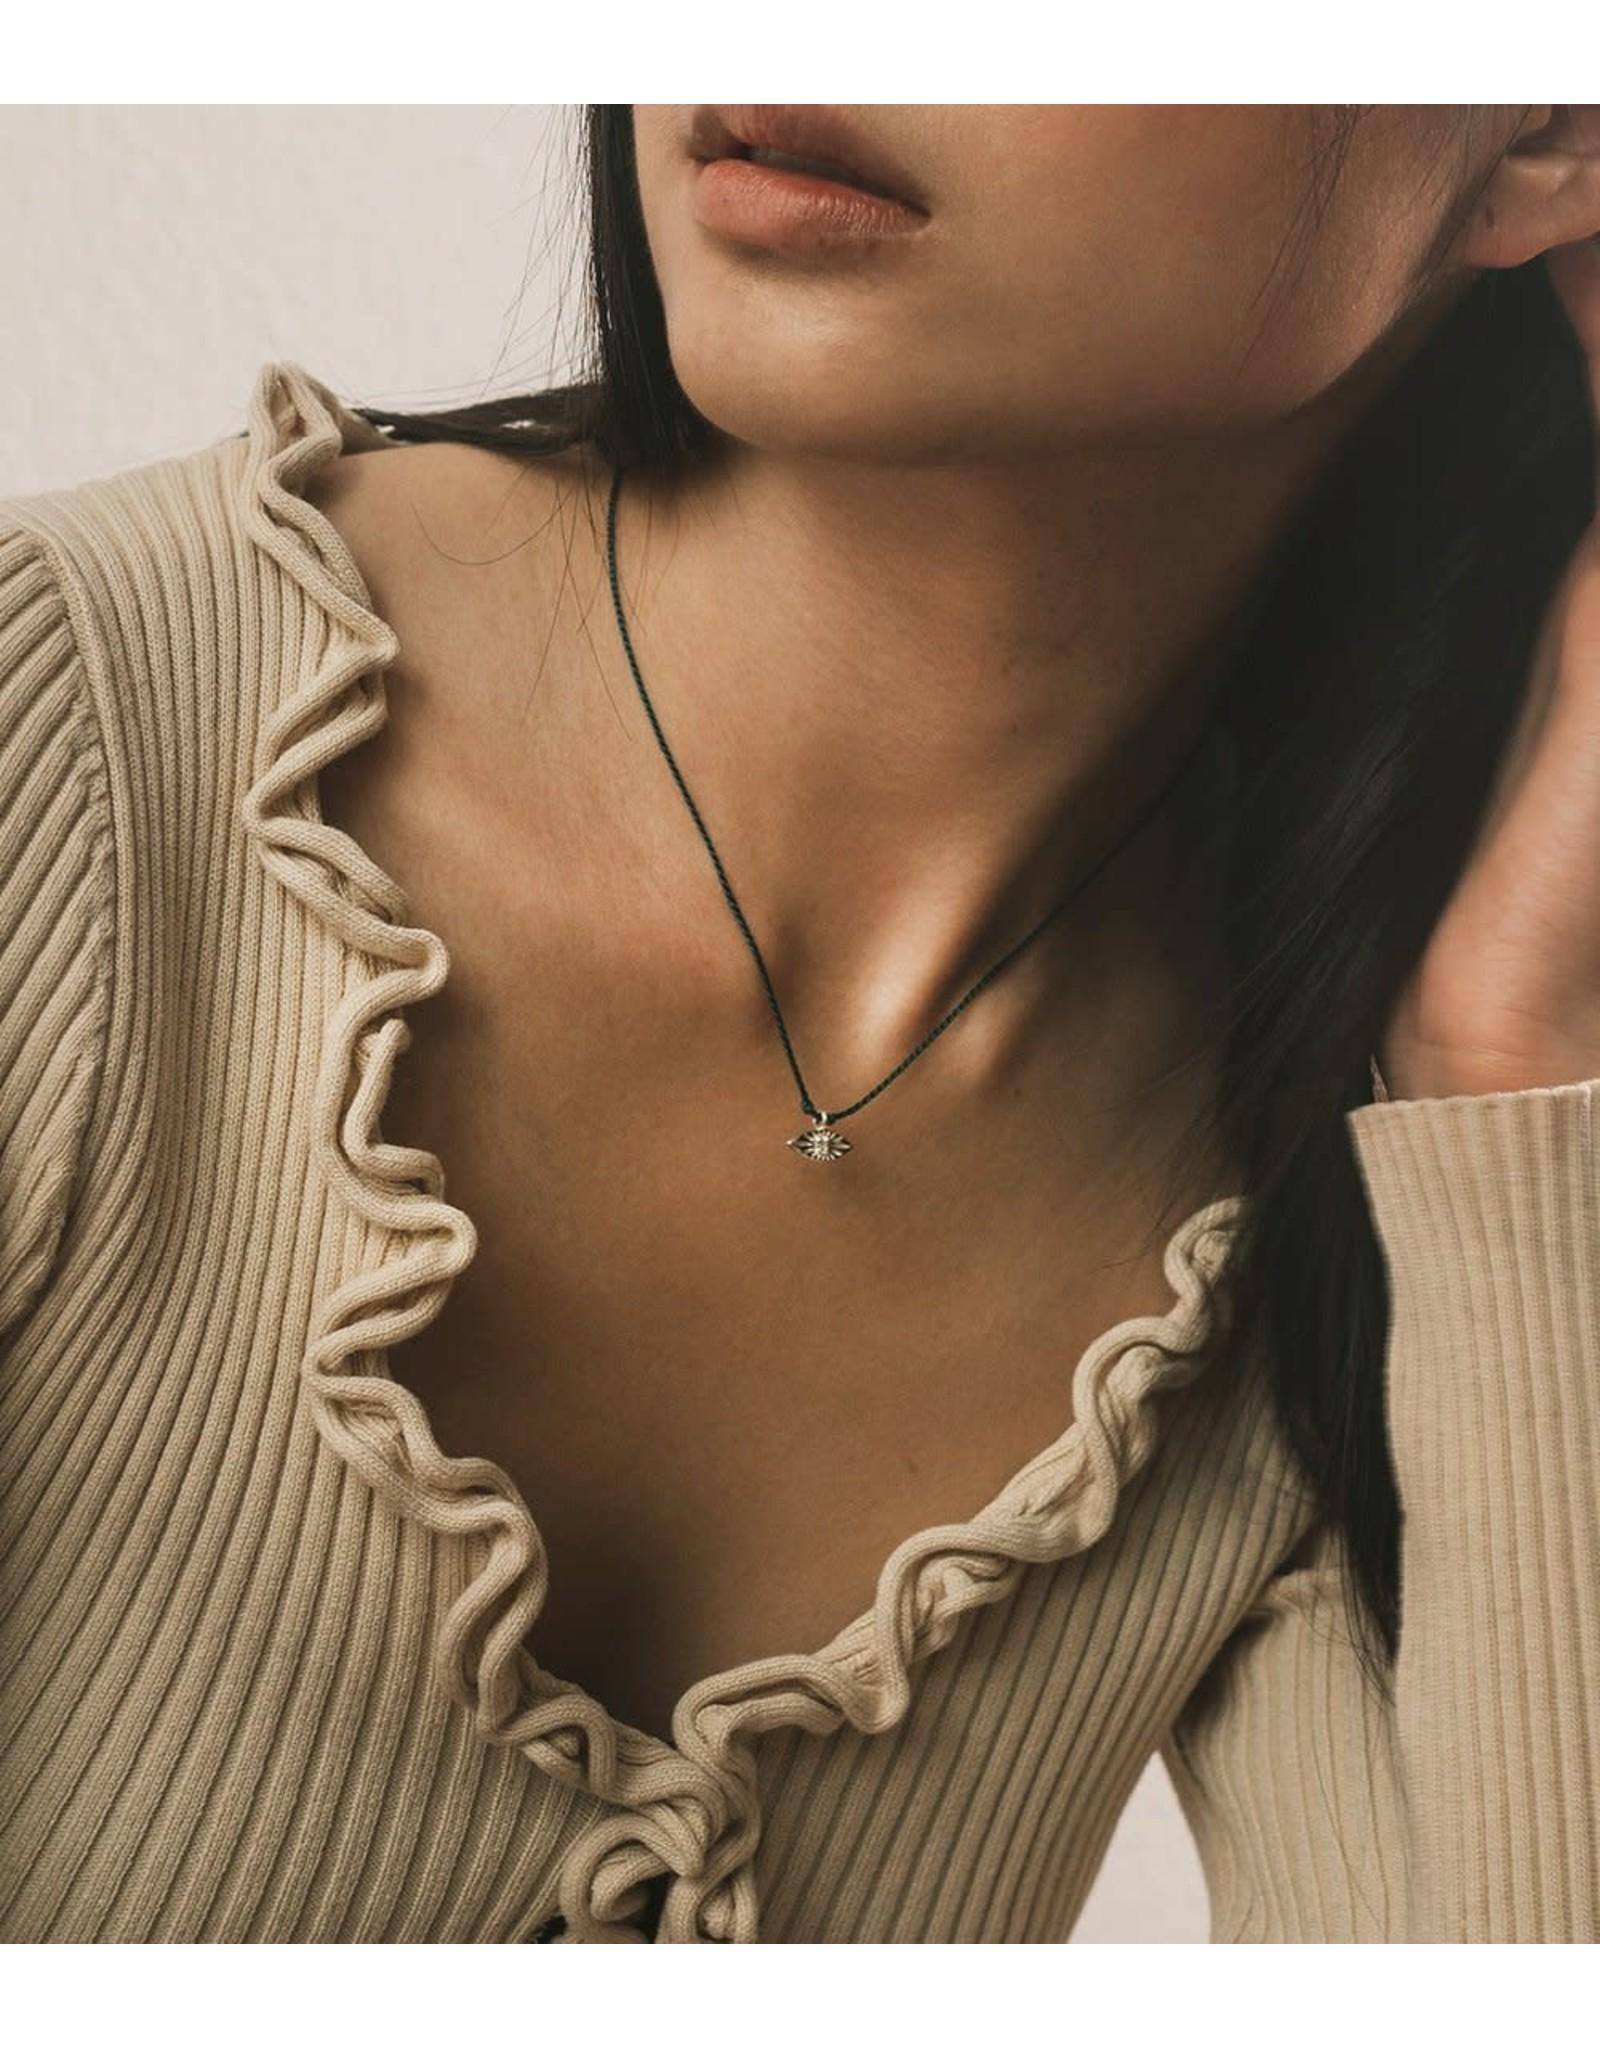 Sterling Silver Jivala Charm Necklace - Evil Eye, India